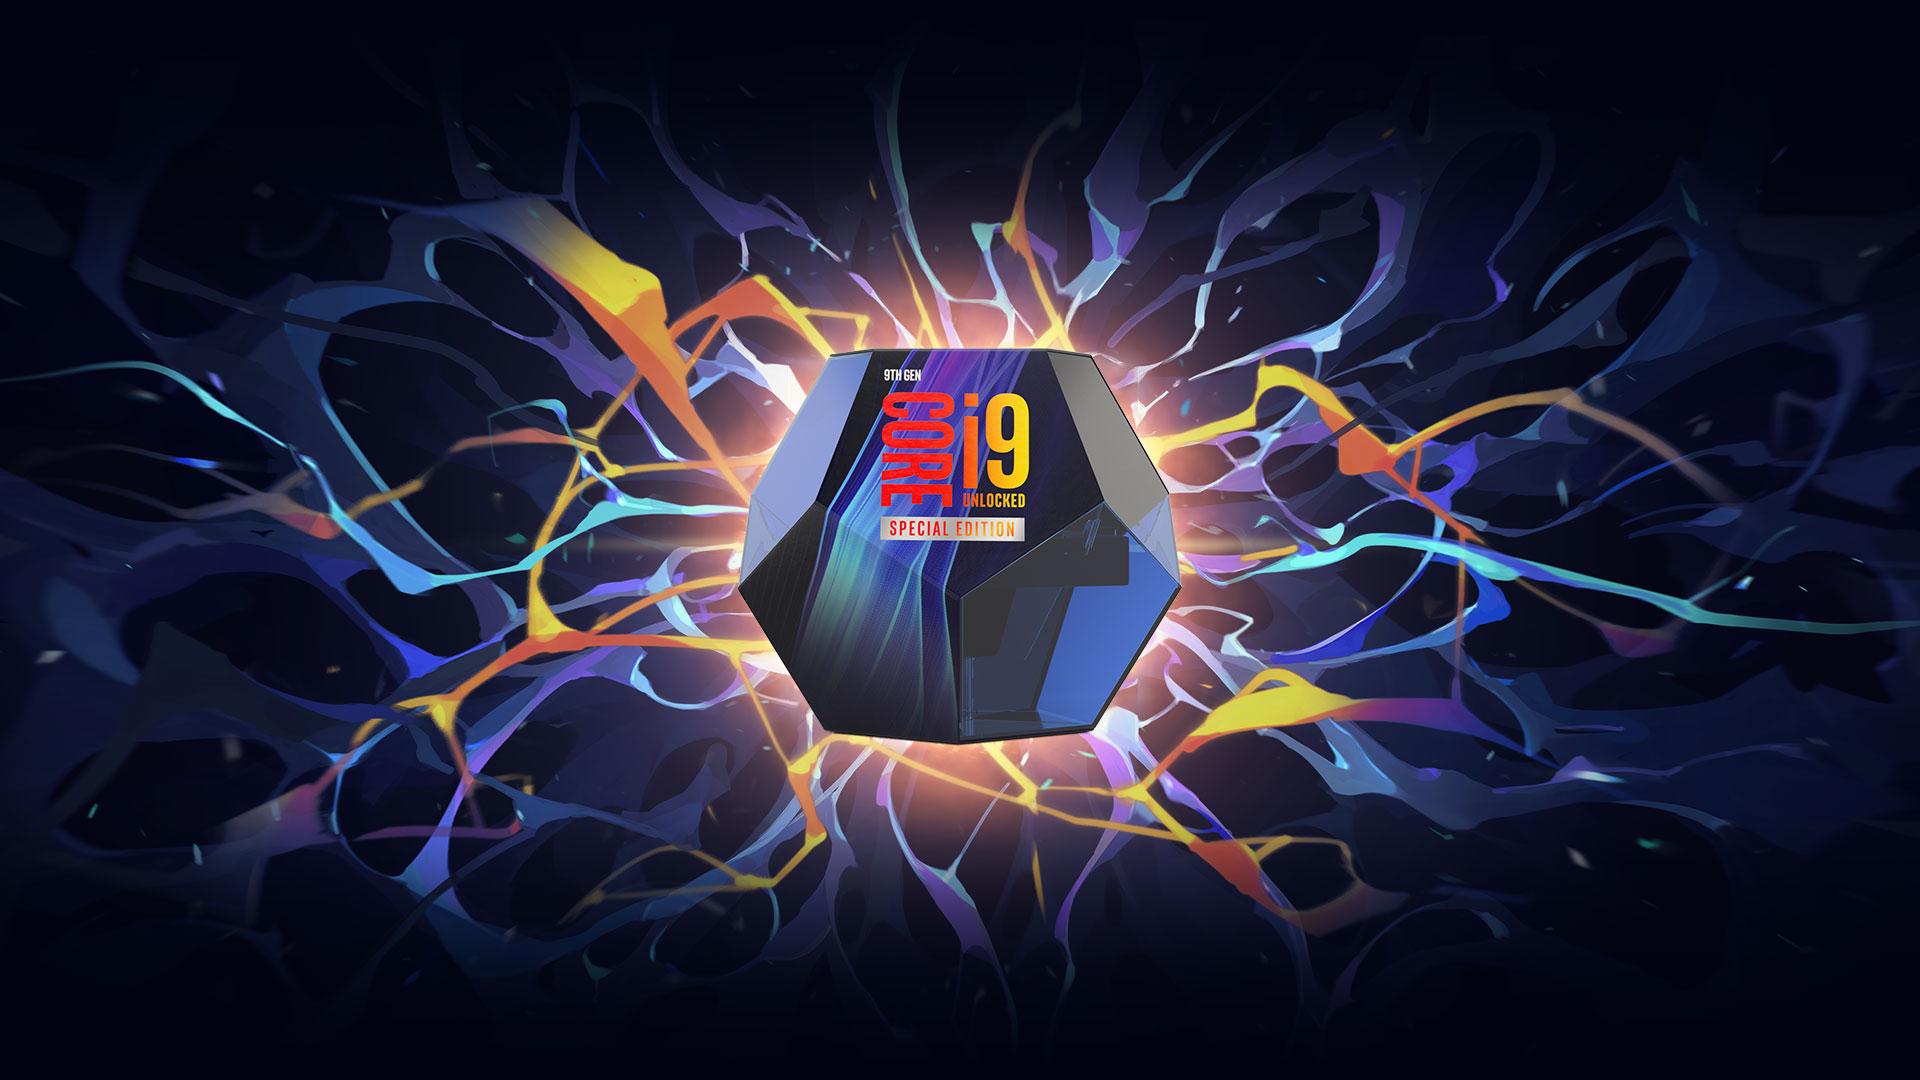 Intel Core I9 9900Ks Octa Core Lga 1151 4Ghz Unlocked Cpu Processor in Blank I9 2021